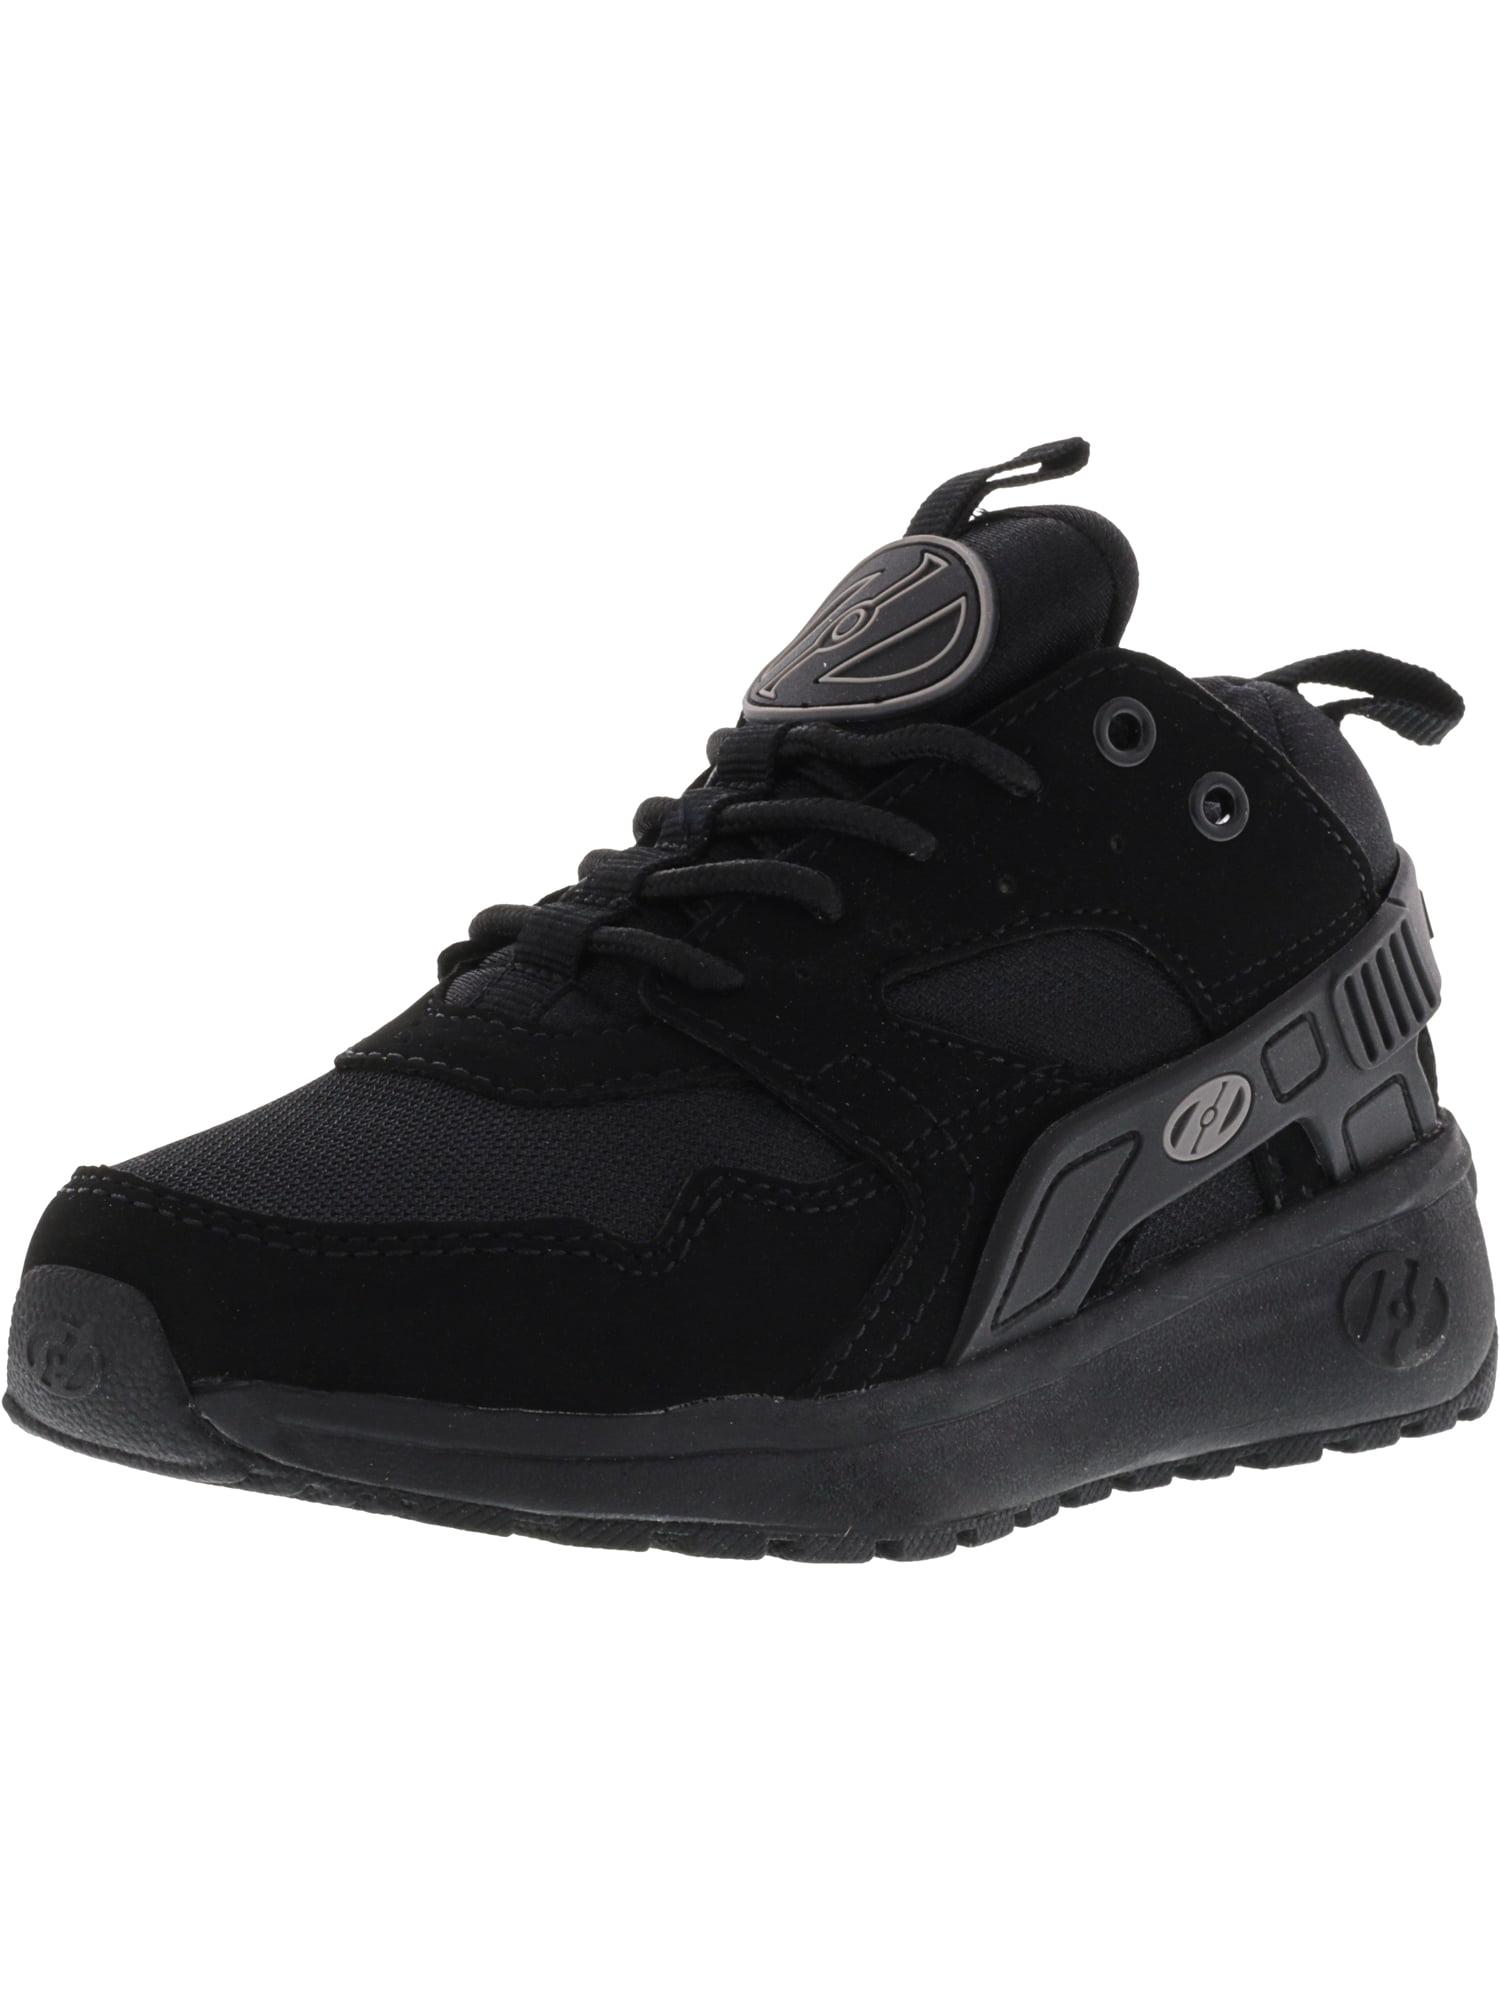 Heelys Force Black / Ankle-High Fashion Sneaker - 4M